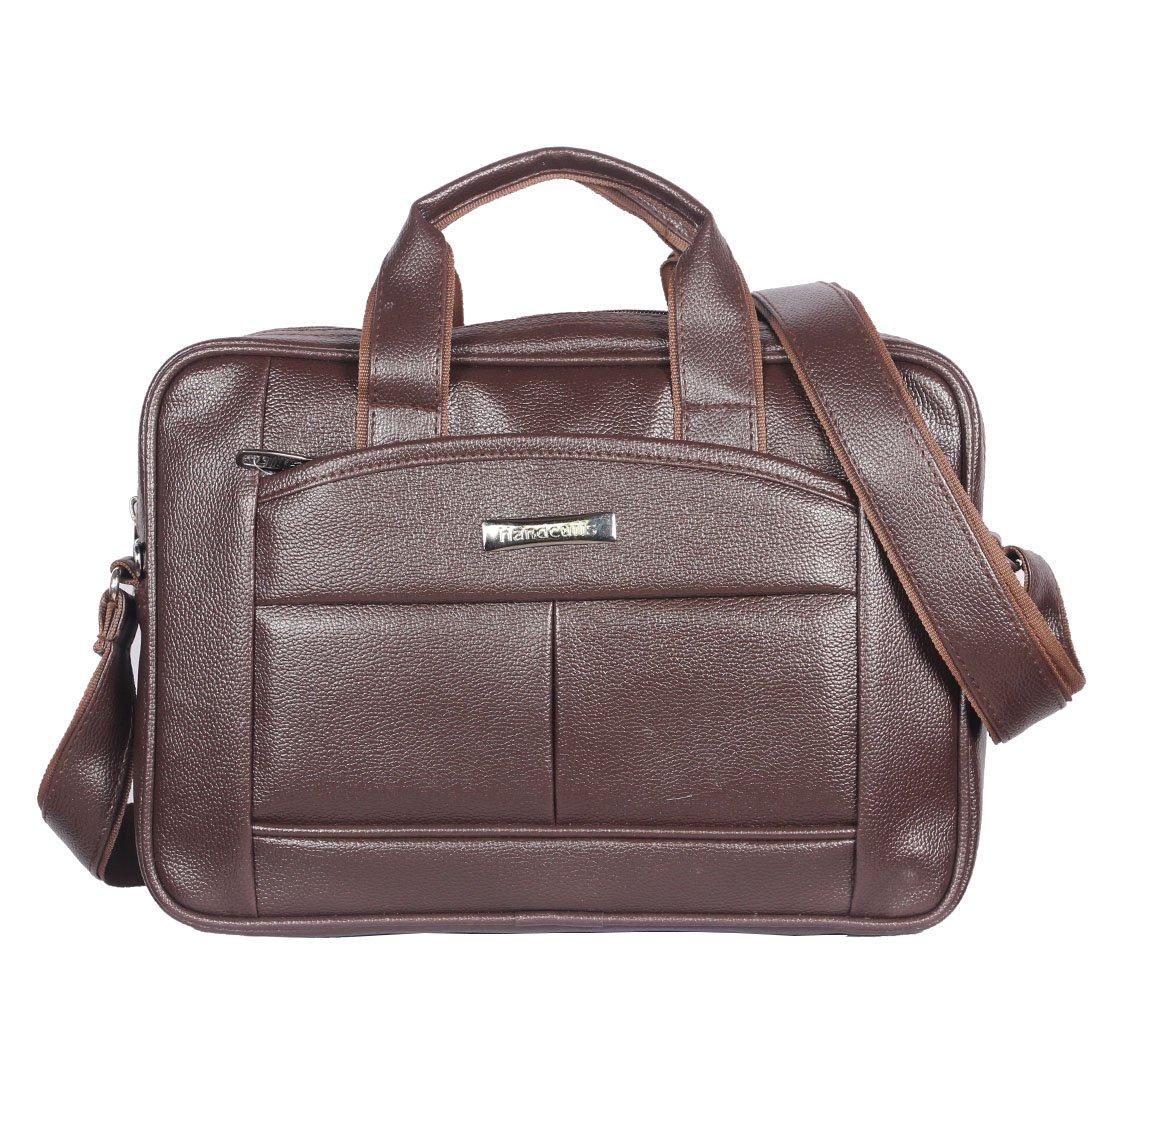 Handcuffs 14 inch Brown Leather Office Laptop Bag for Men  BFLAPBA GBR1  Laptop Messenger   Shoulder Bags